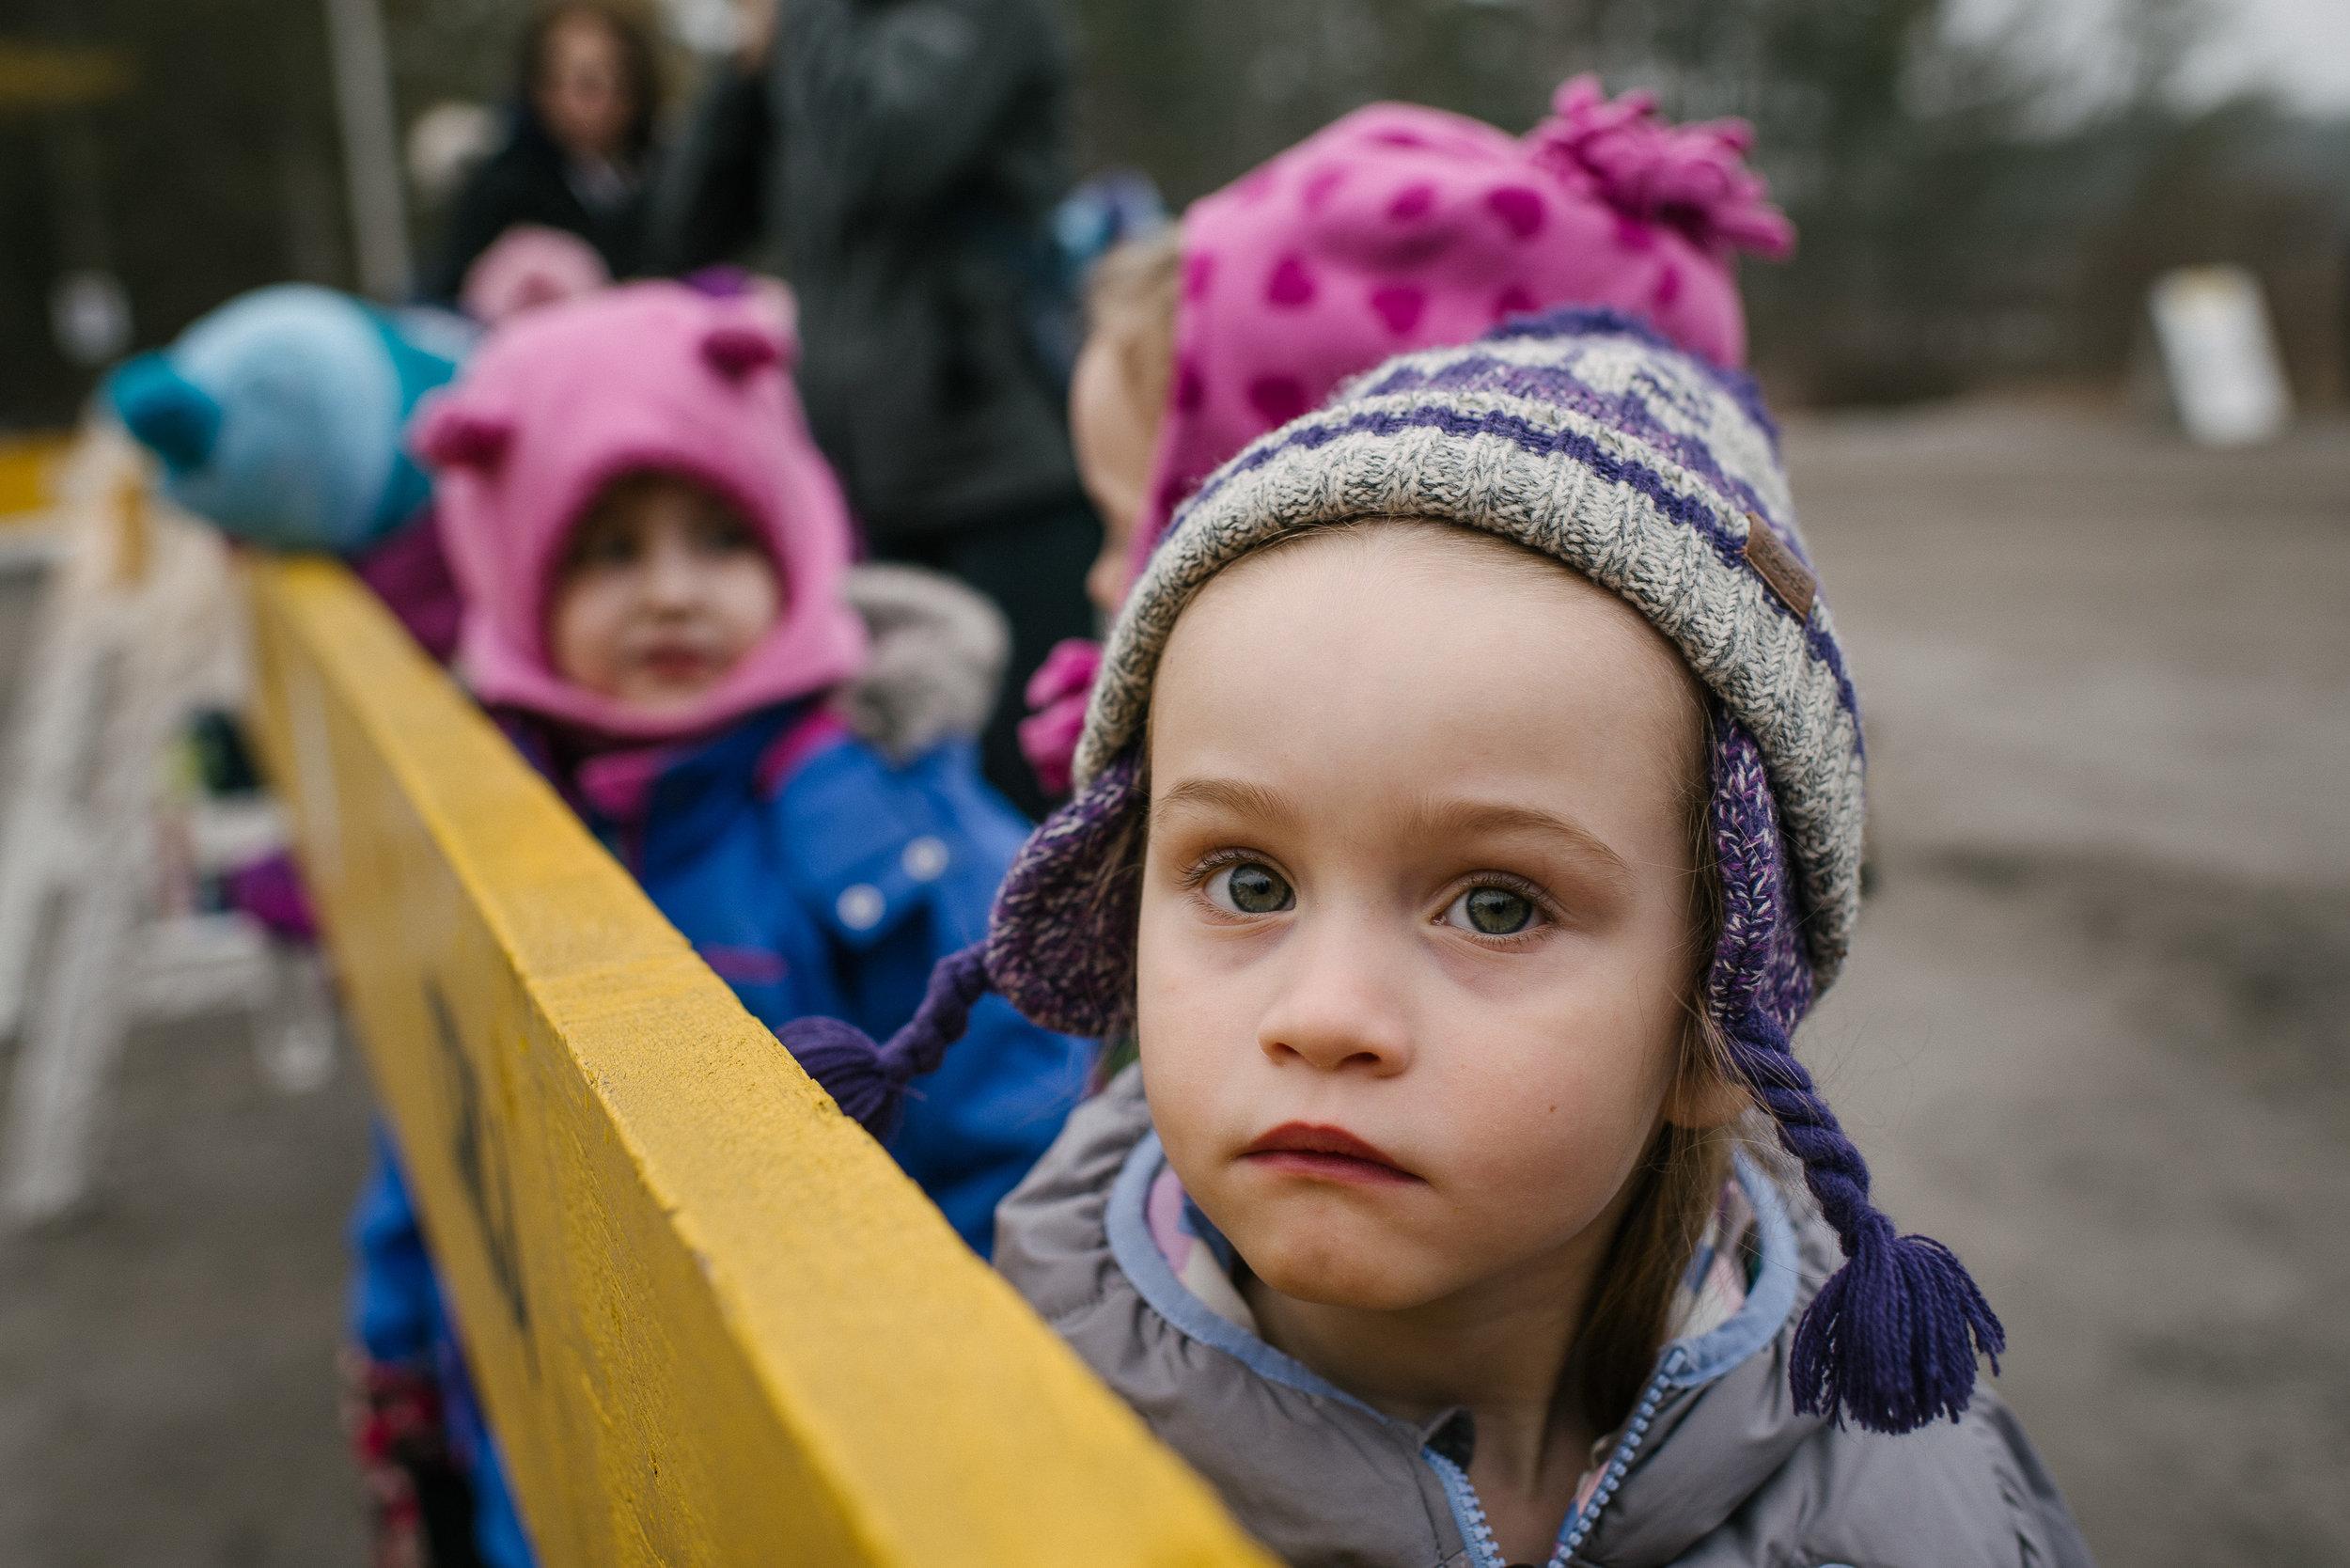 documentary school photography viara mileva kingston toronto ottawa-094546vm.jpg